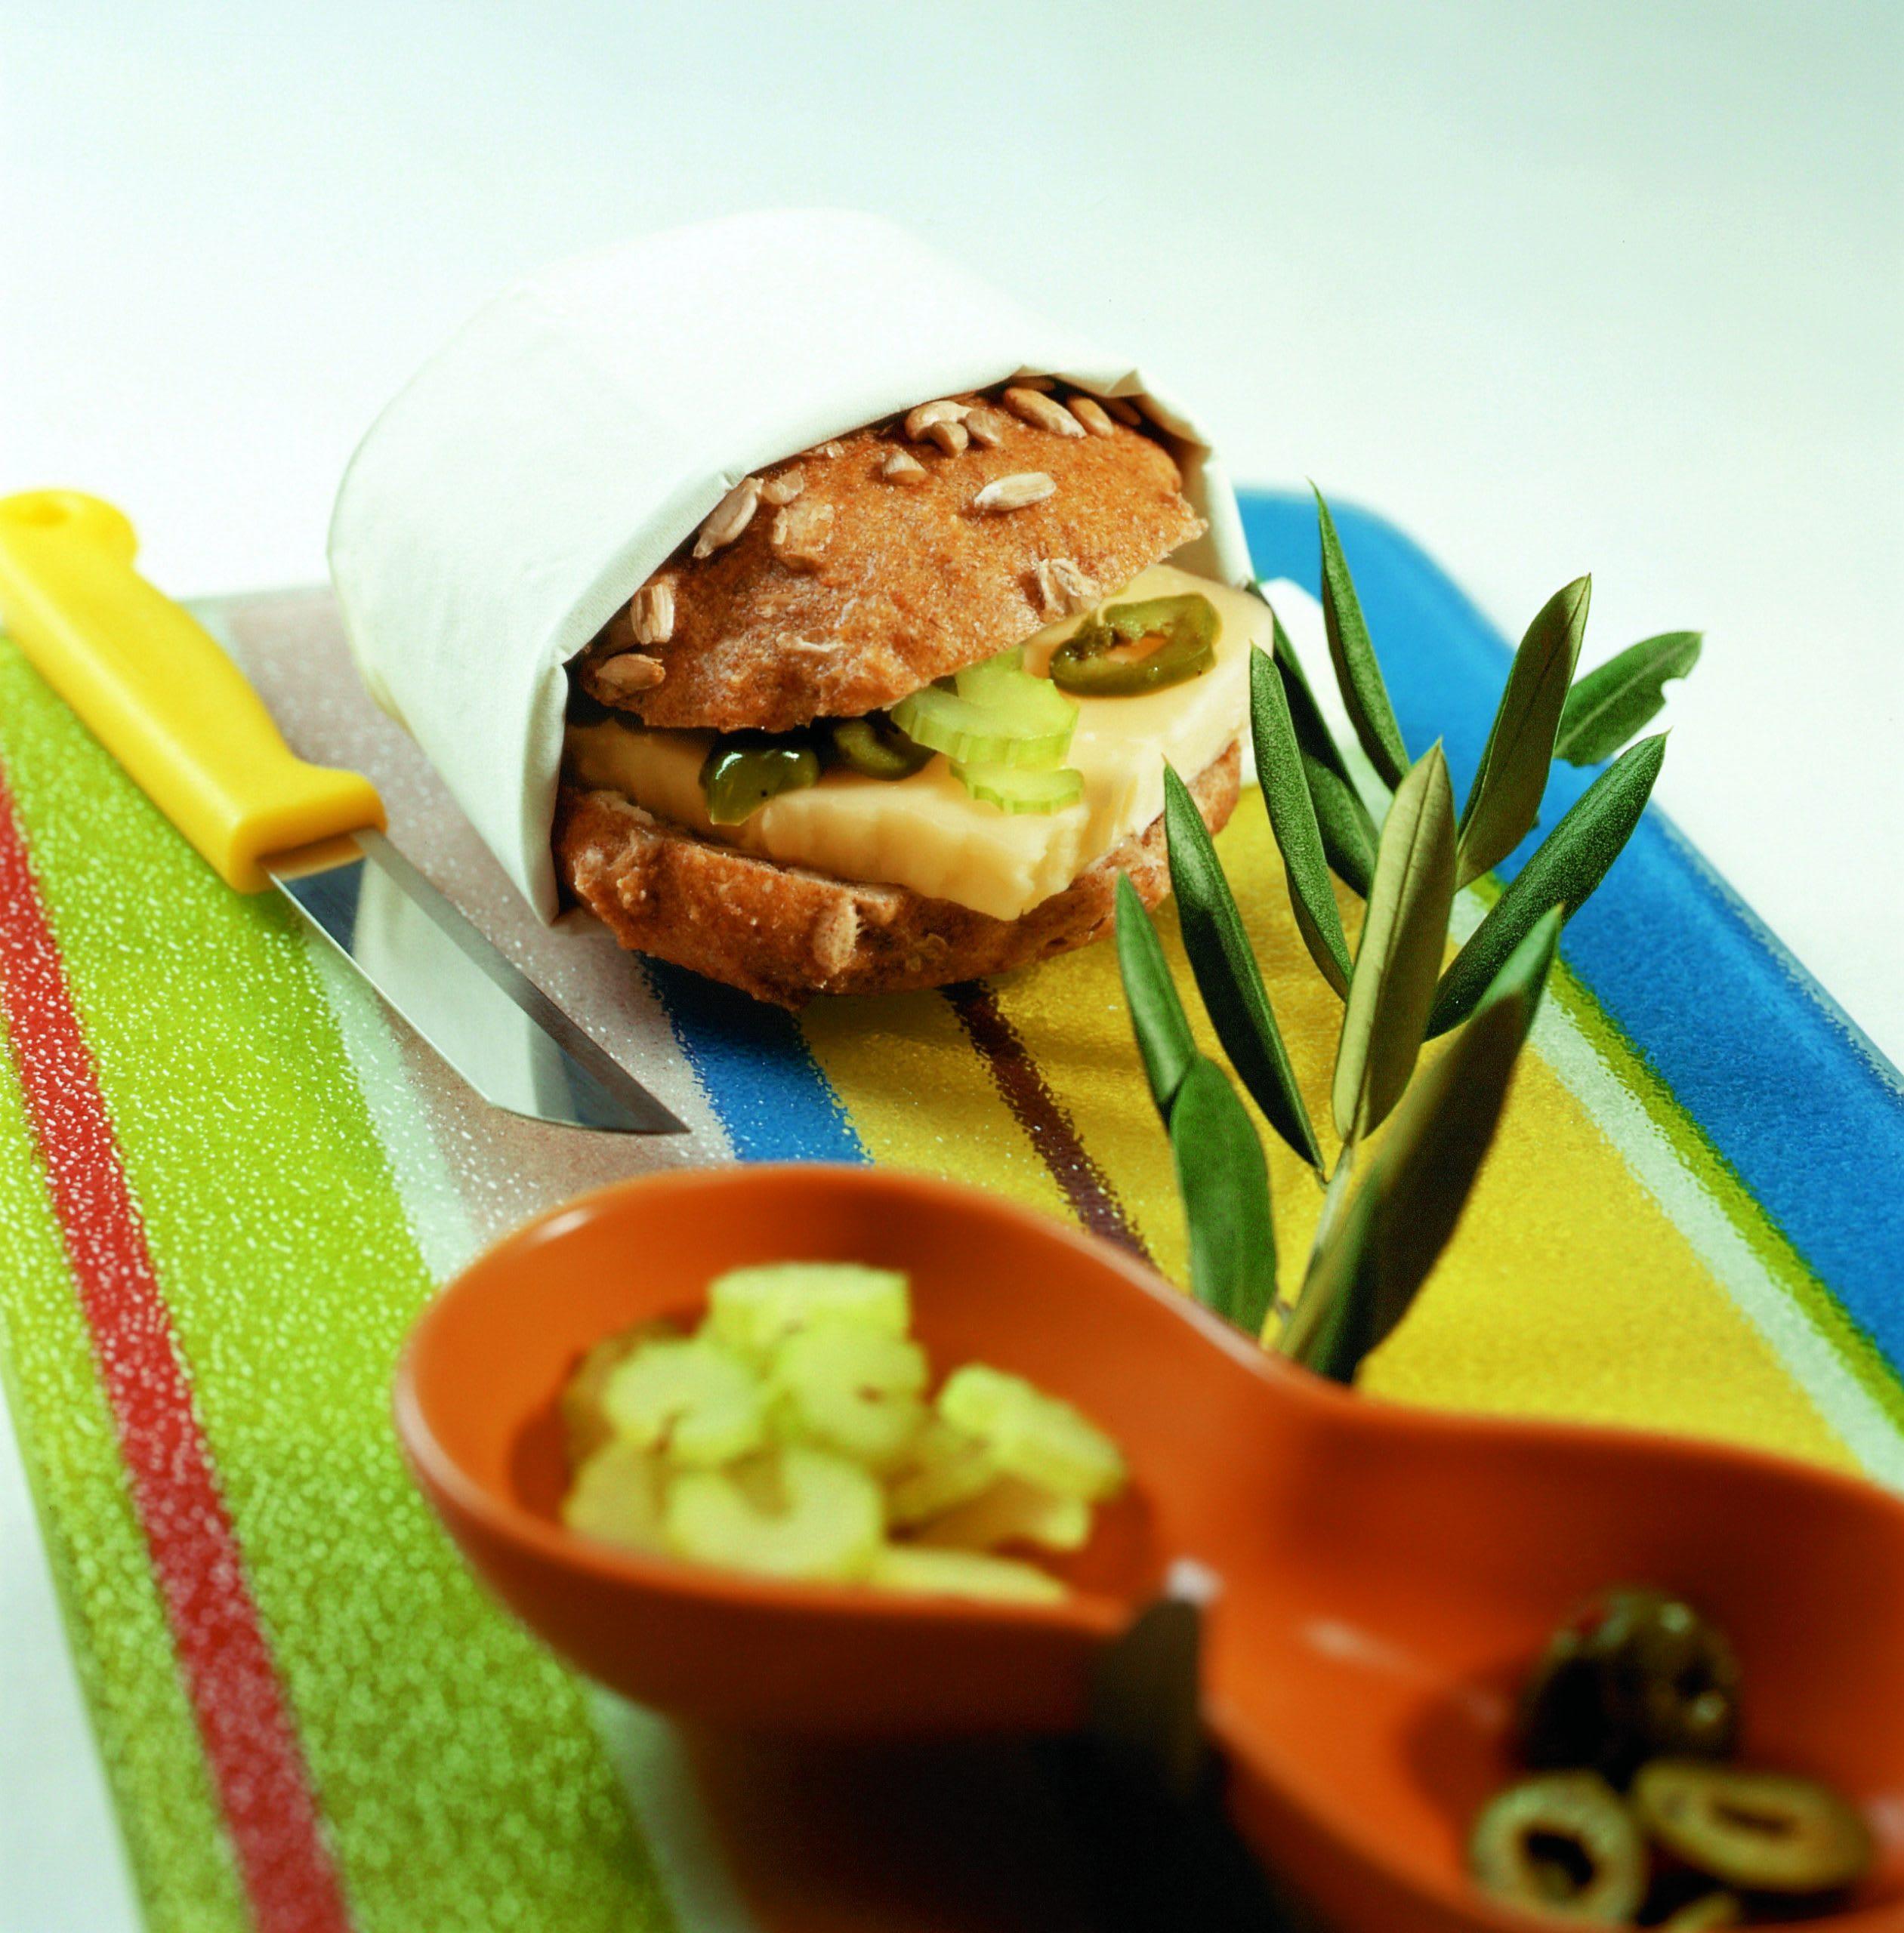 Sandwich au céleri